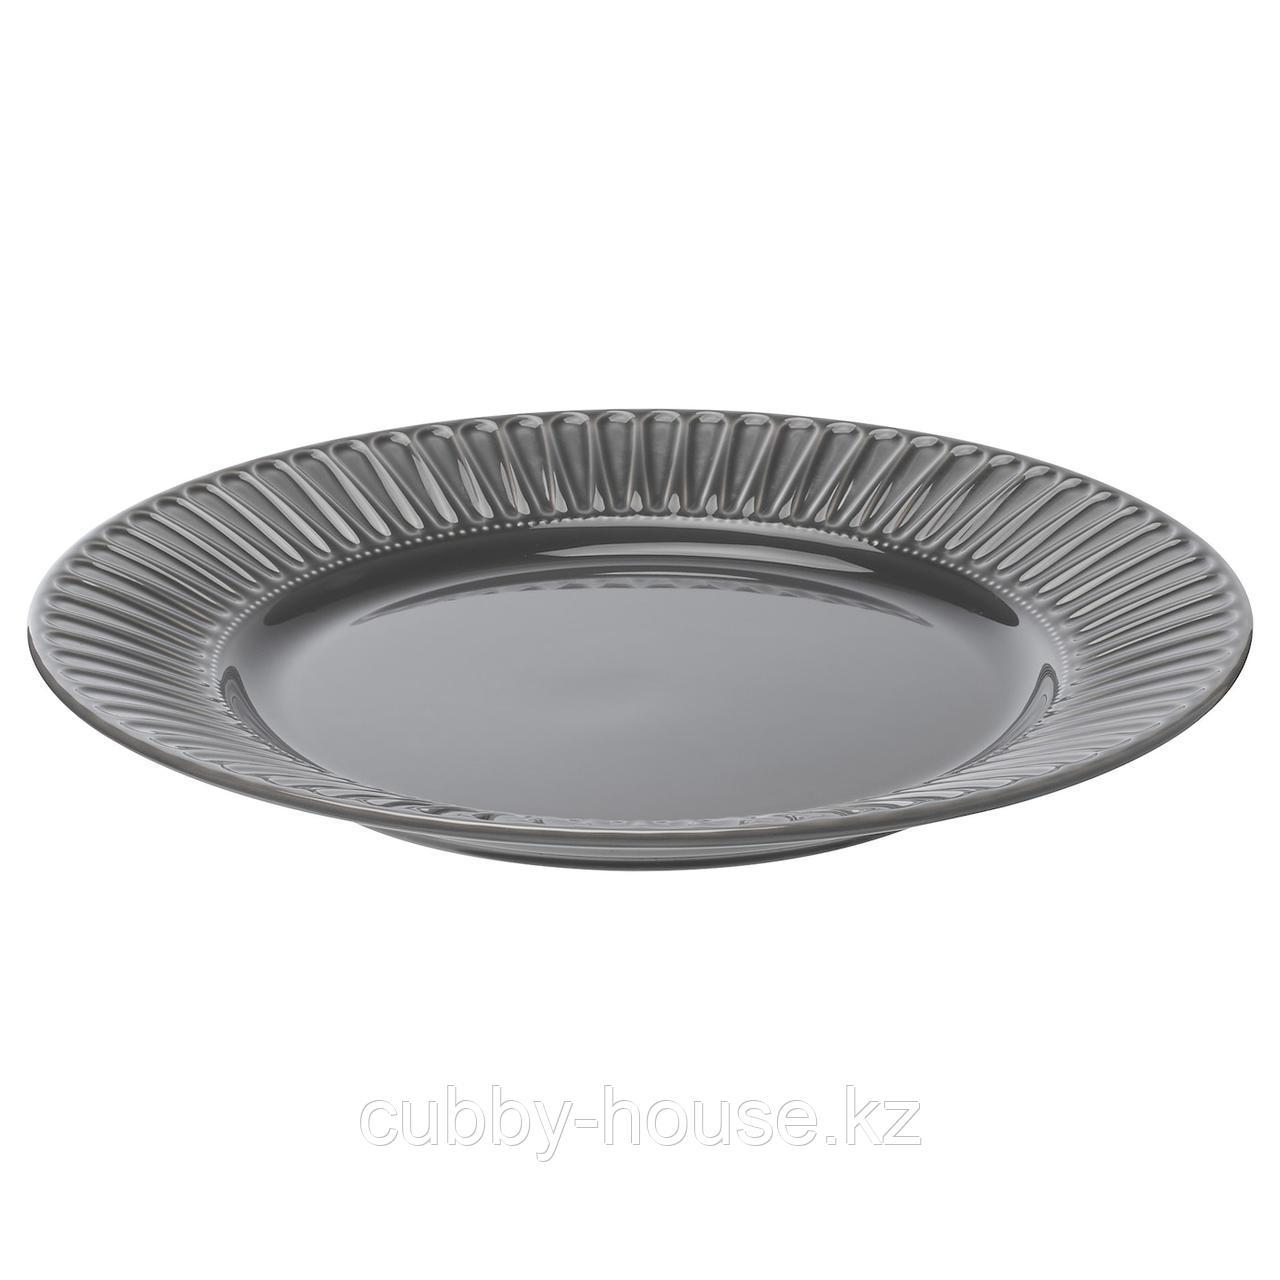 СТРИММИГ Тарелка, каменная керамика серый, 27 см